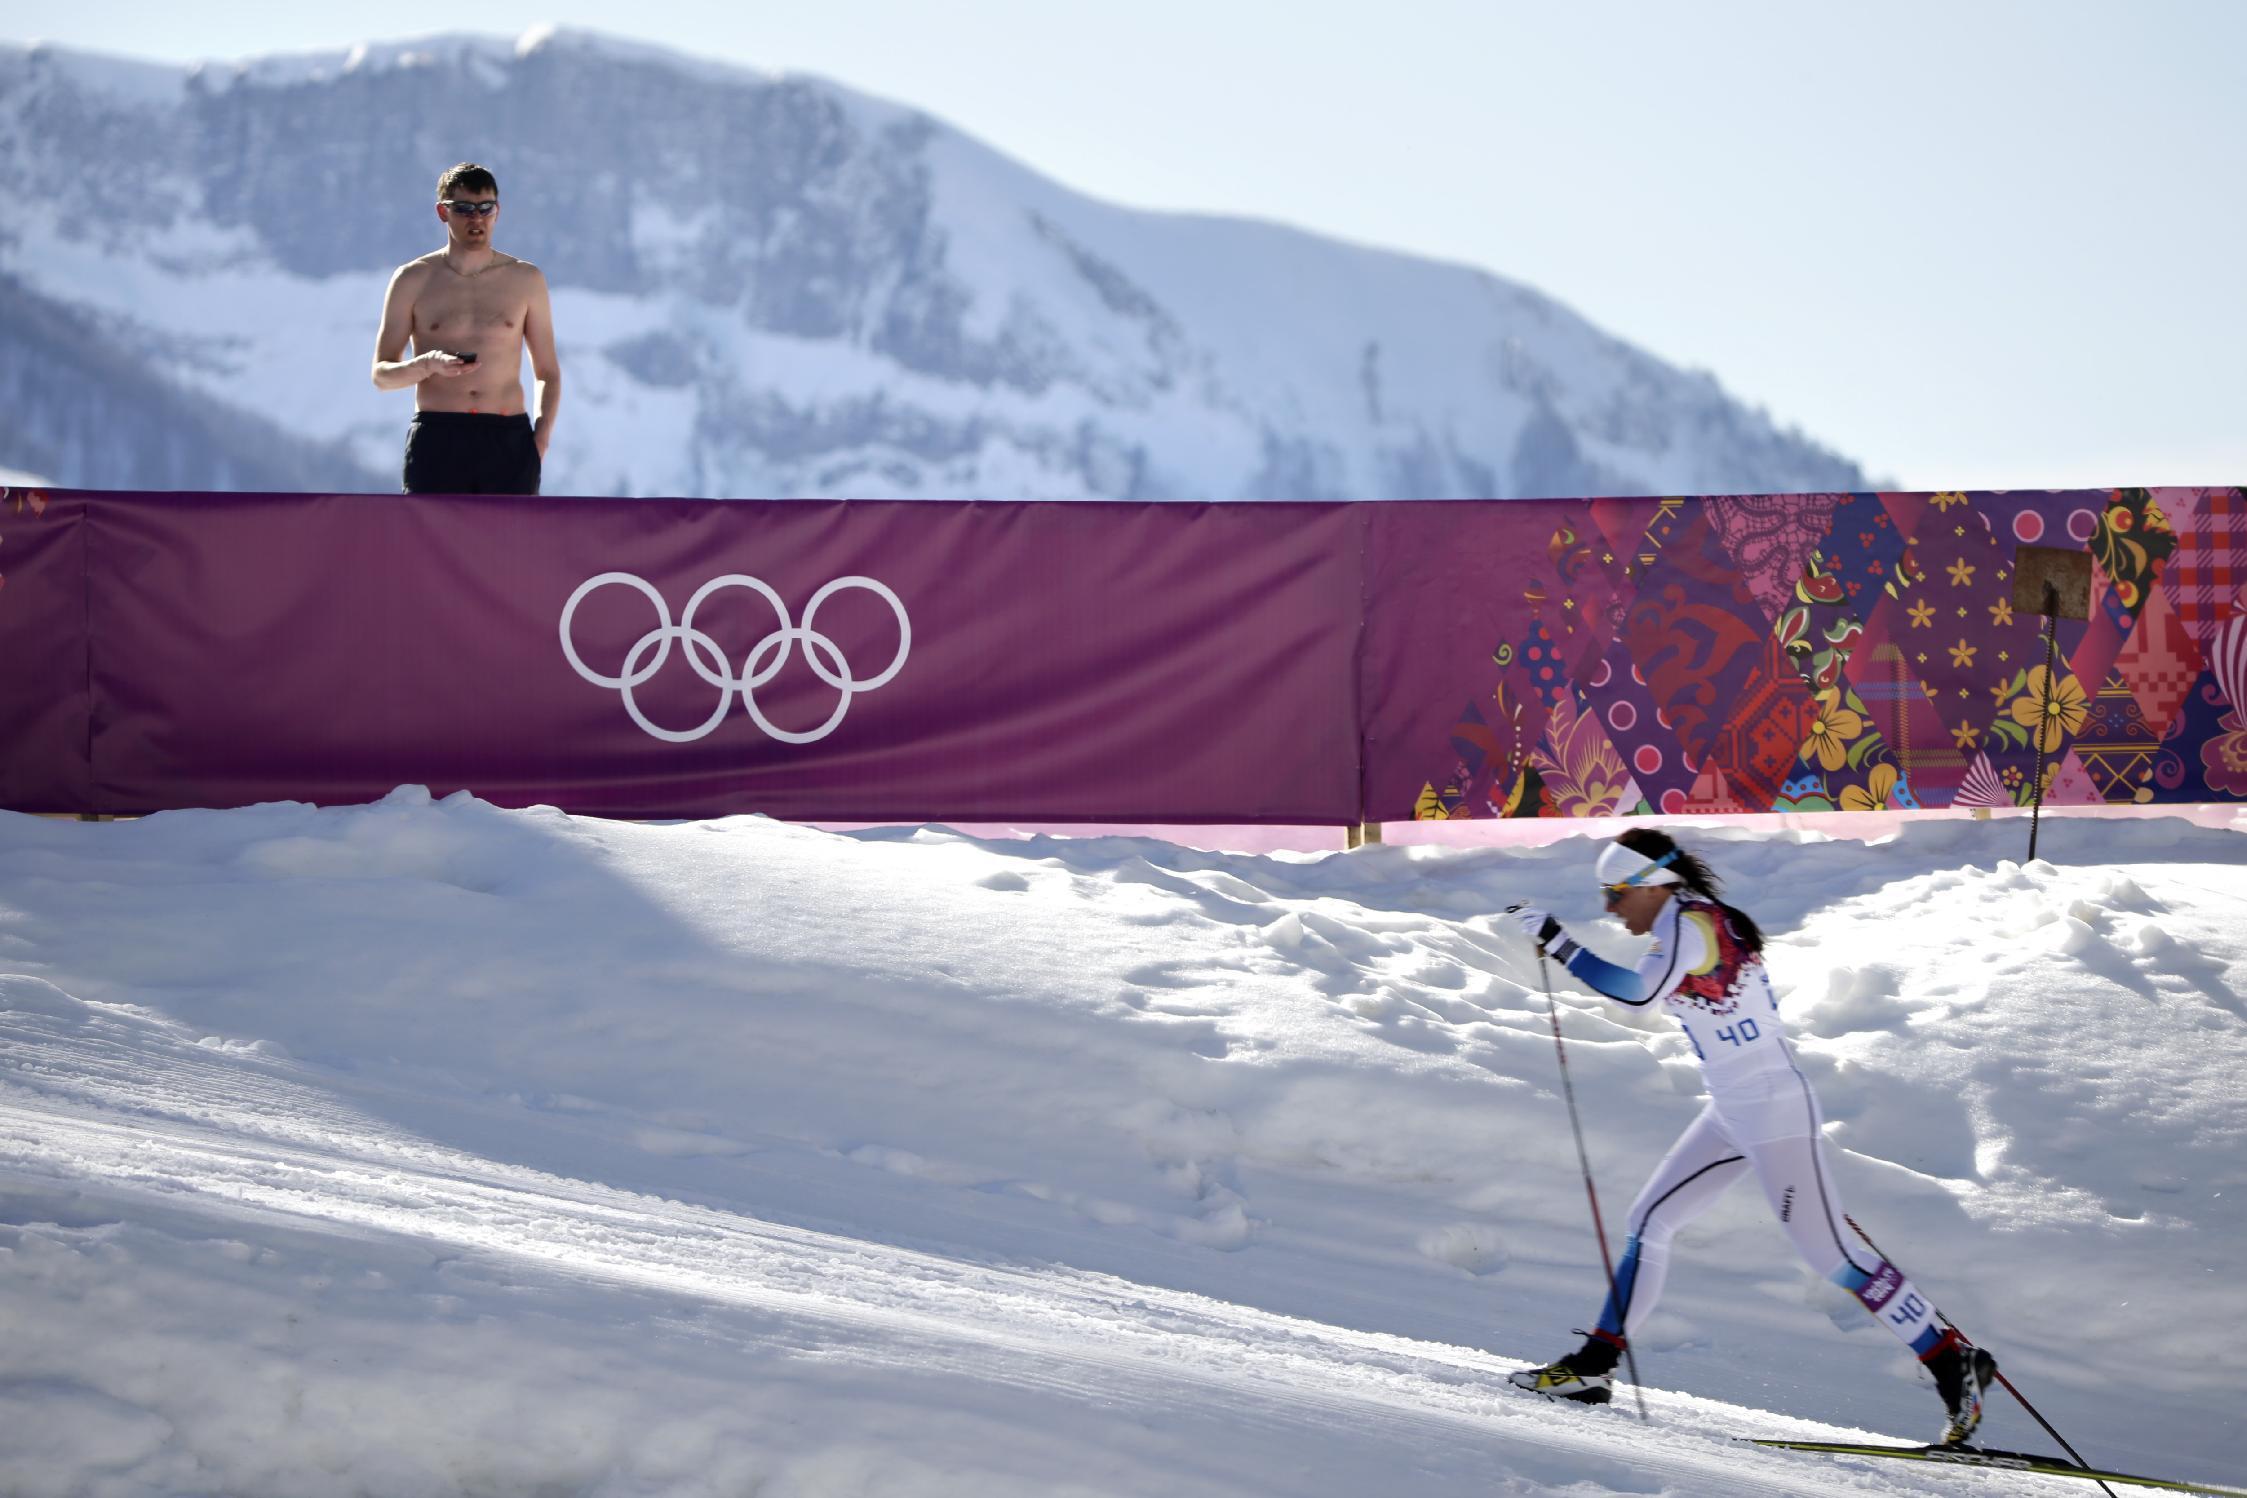 Эро фото с олимпиады лыжница 1 фотография